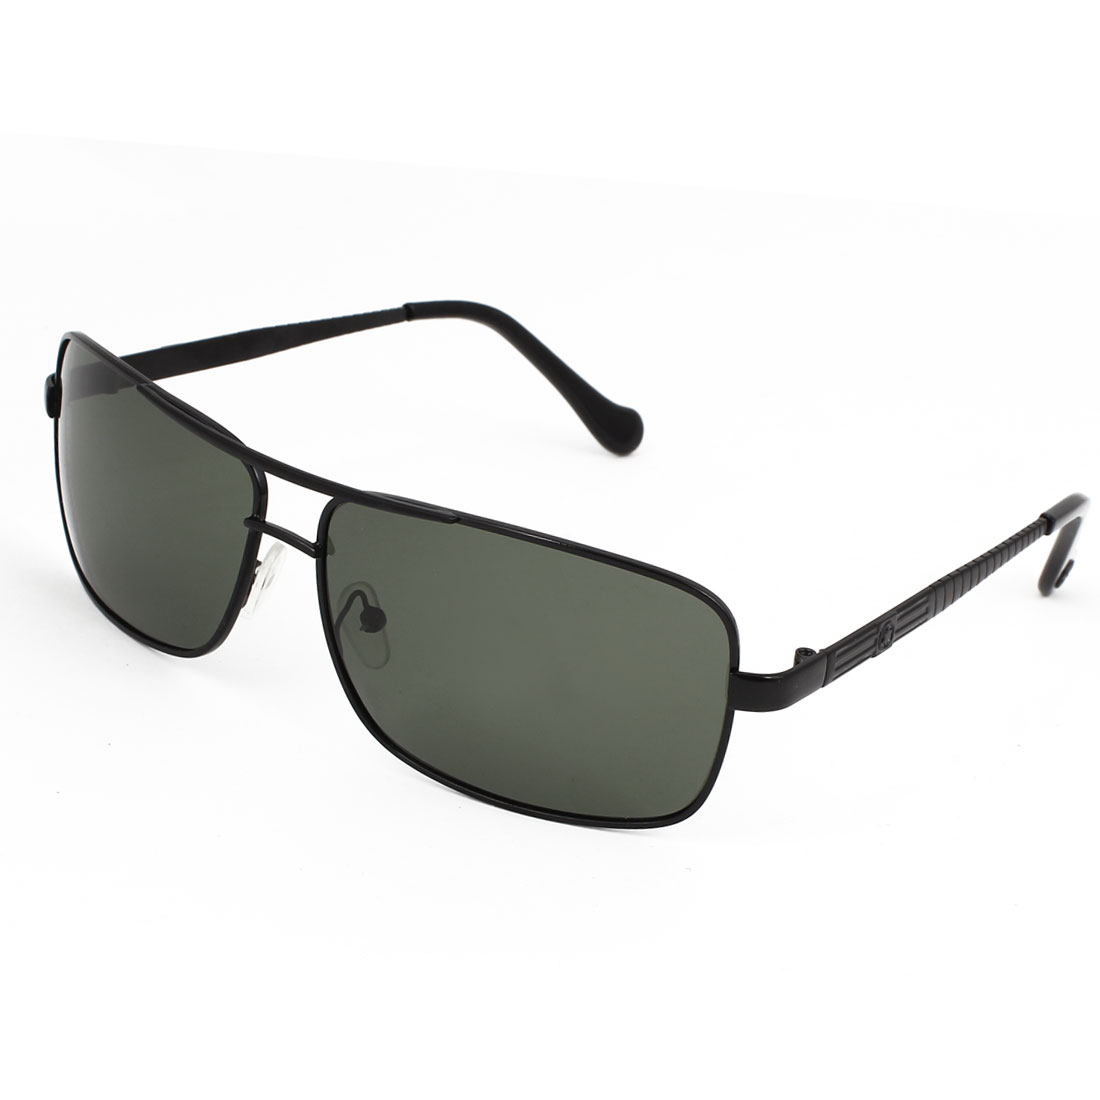 Men Rectangle Shape Double Bridge Full Frame Black Lens Polarized Sunglasses